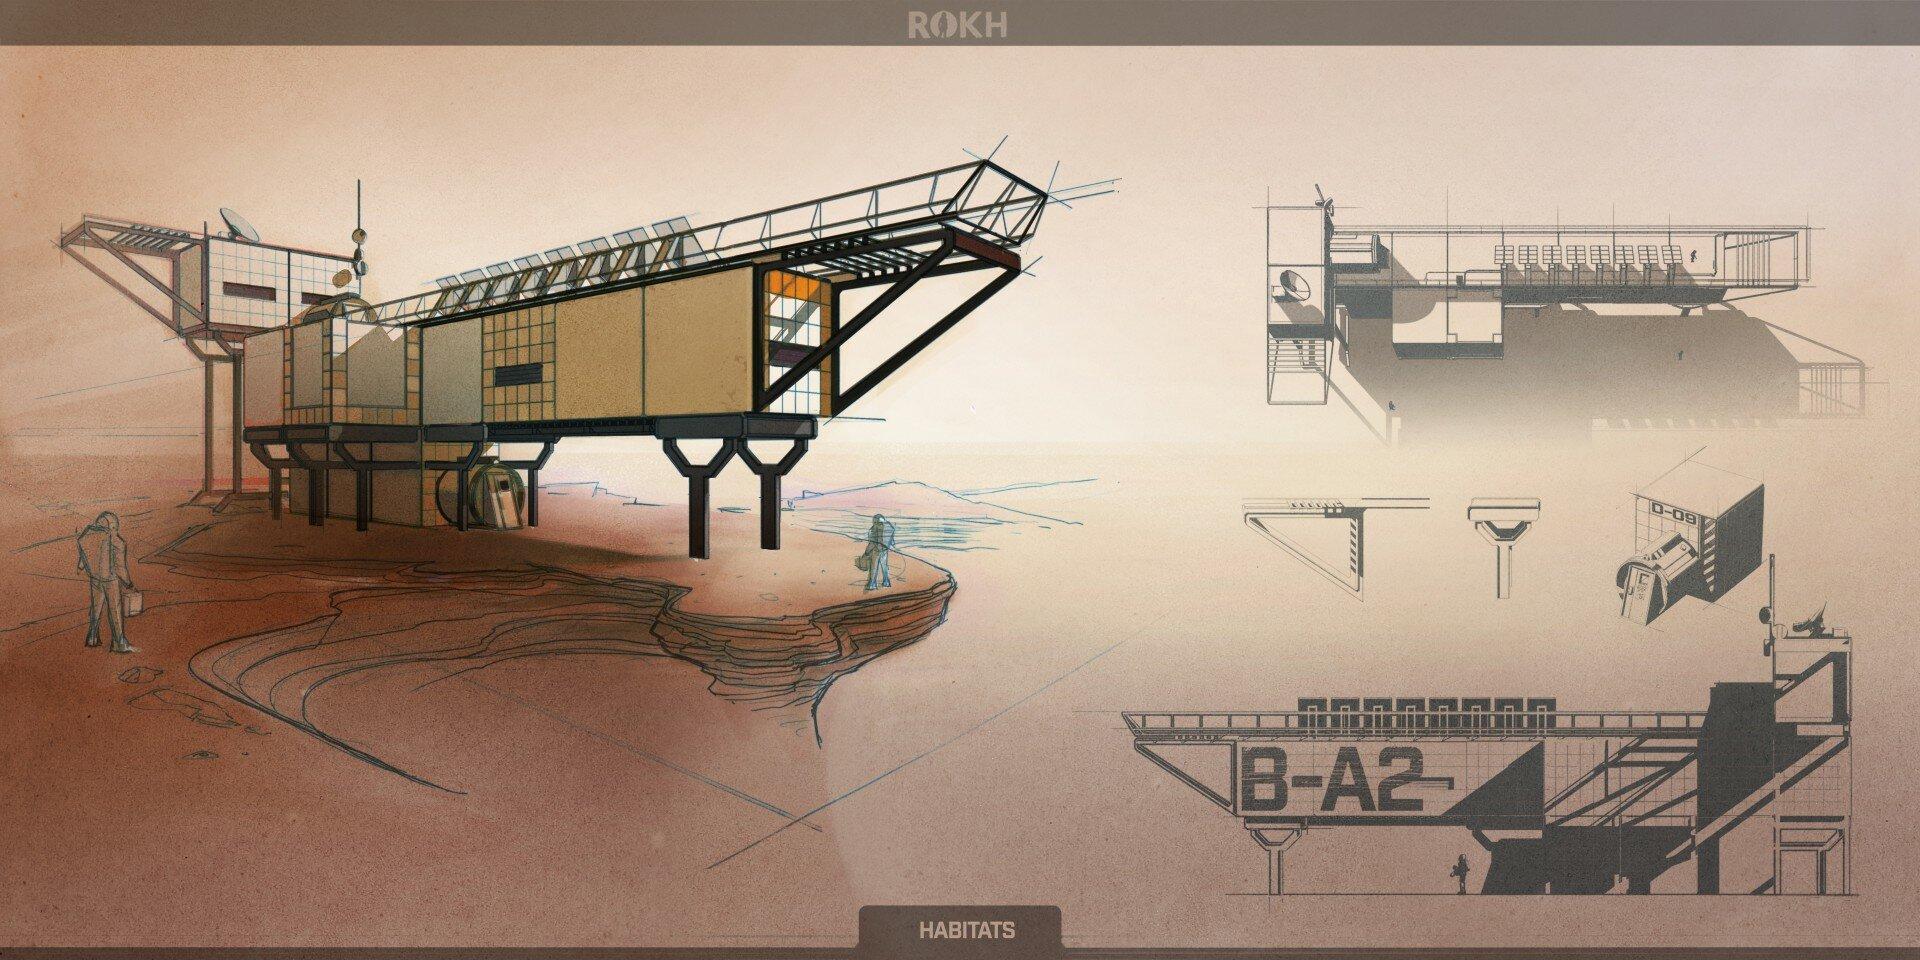 mars base design - photo #10